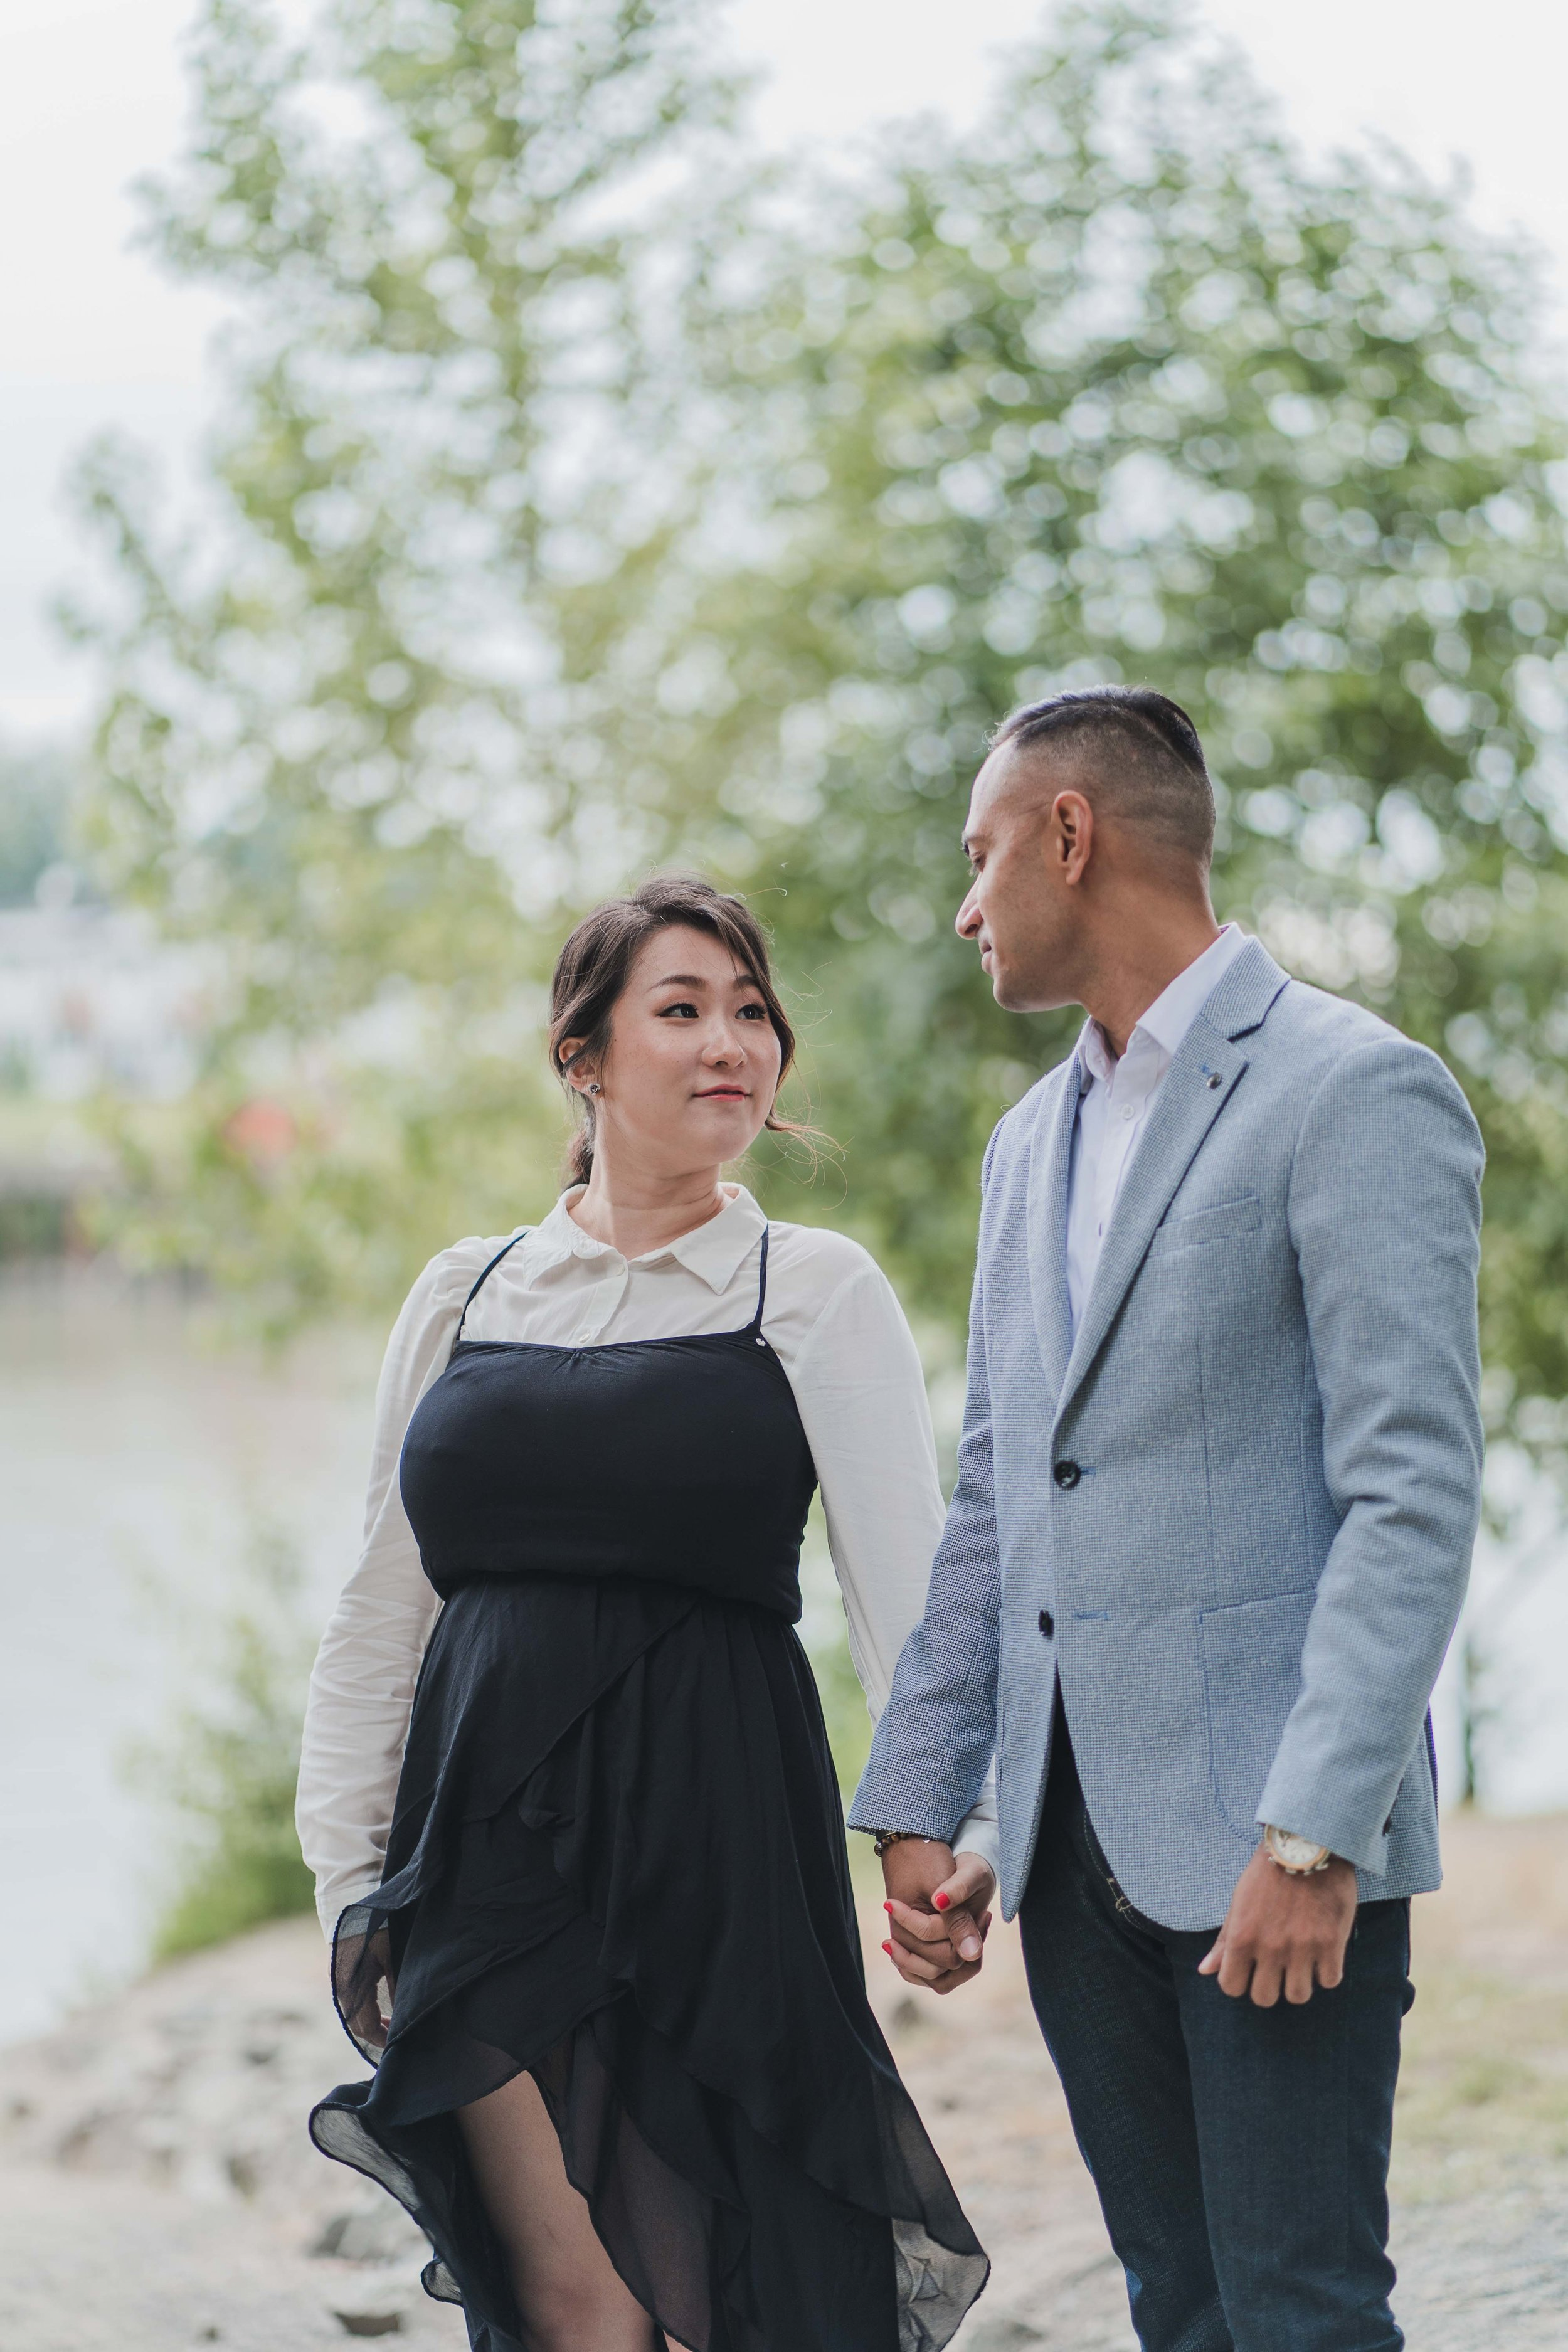 20190622 - Monika & Johnson Engagement - 0084.jpg